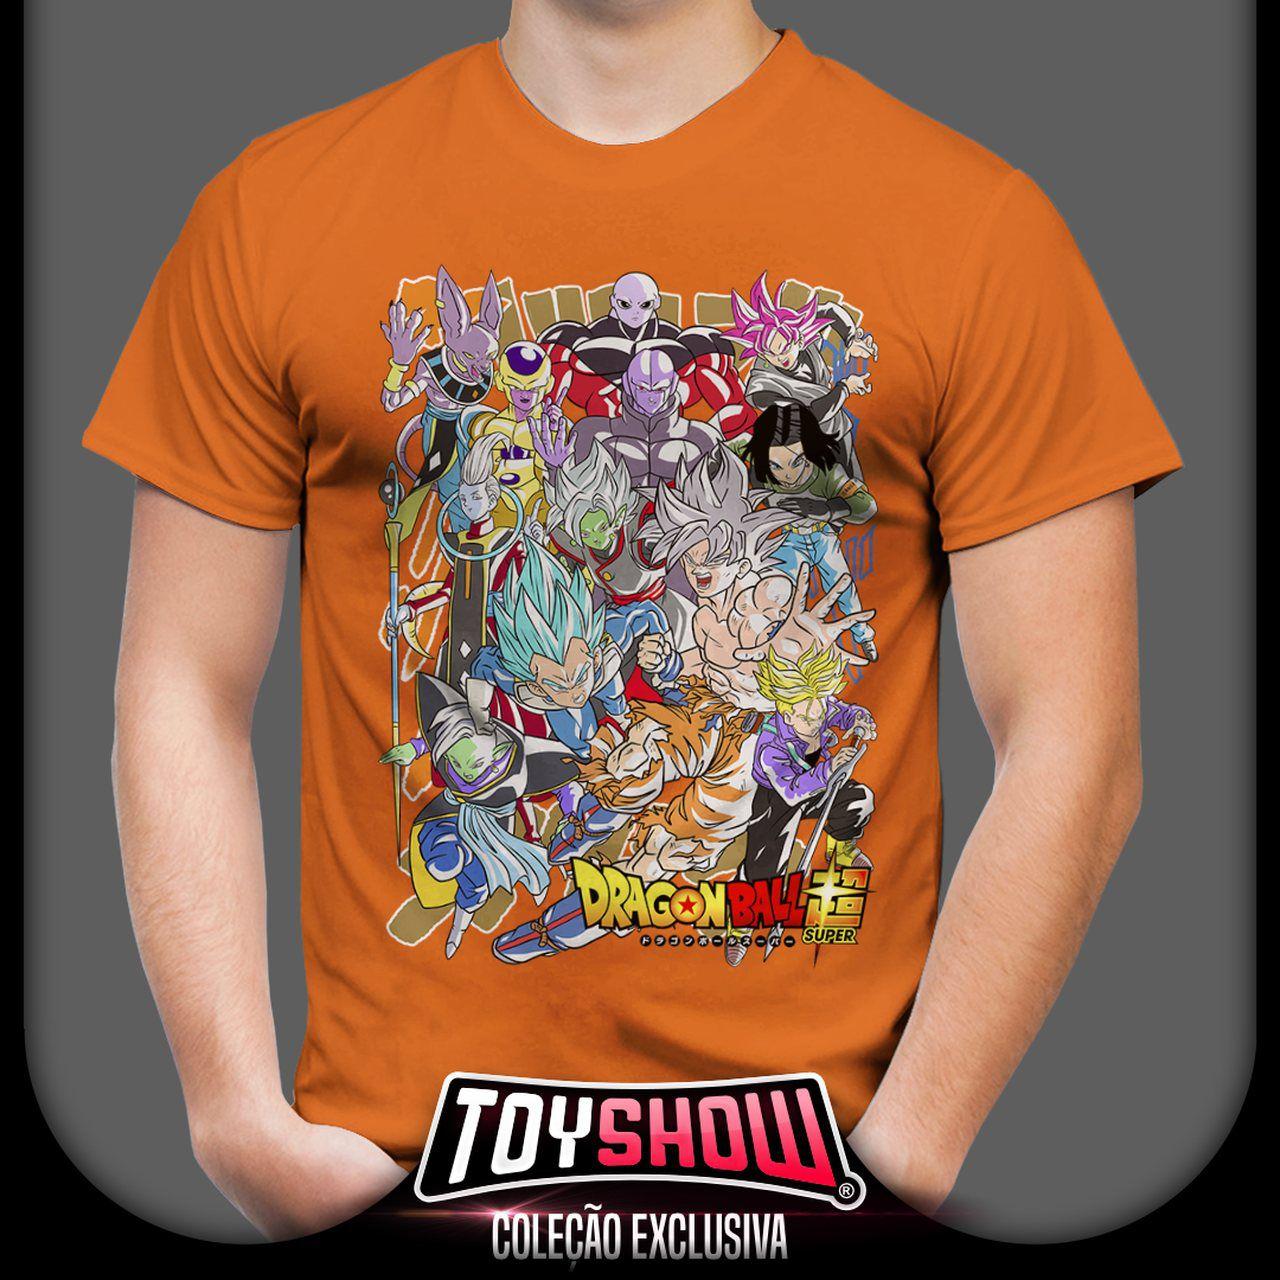 Camiseta Personagens Dragon Ball Super - Exclusiva Toyshow (Laranja) - Ev - Anime Mangá